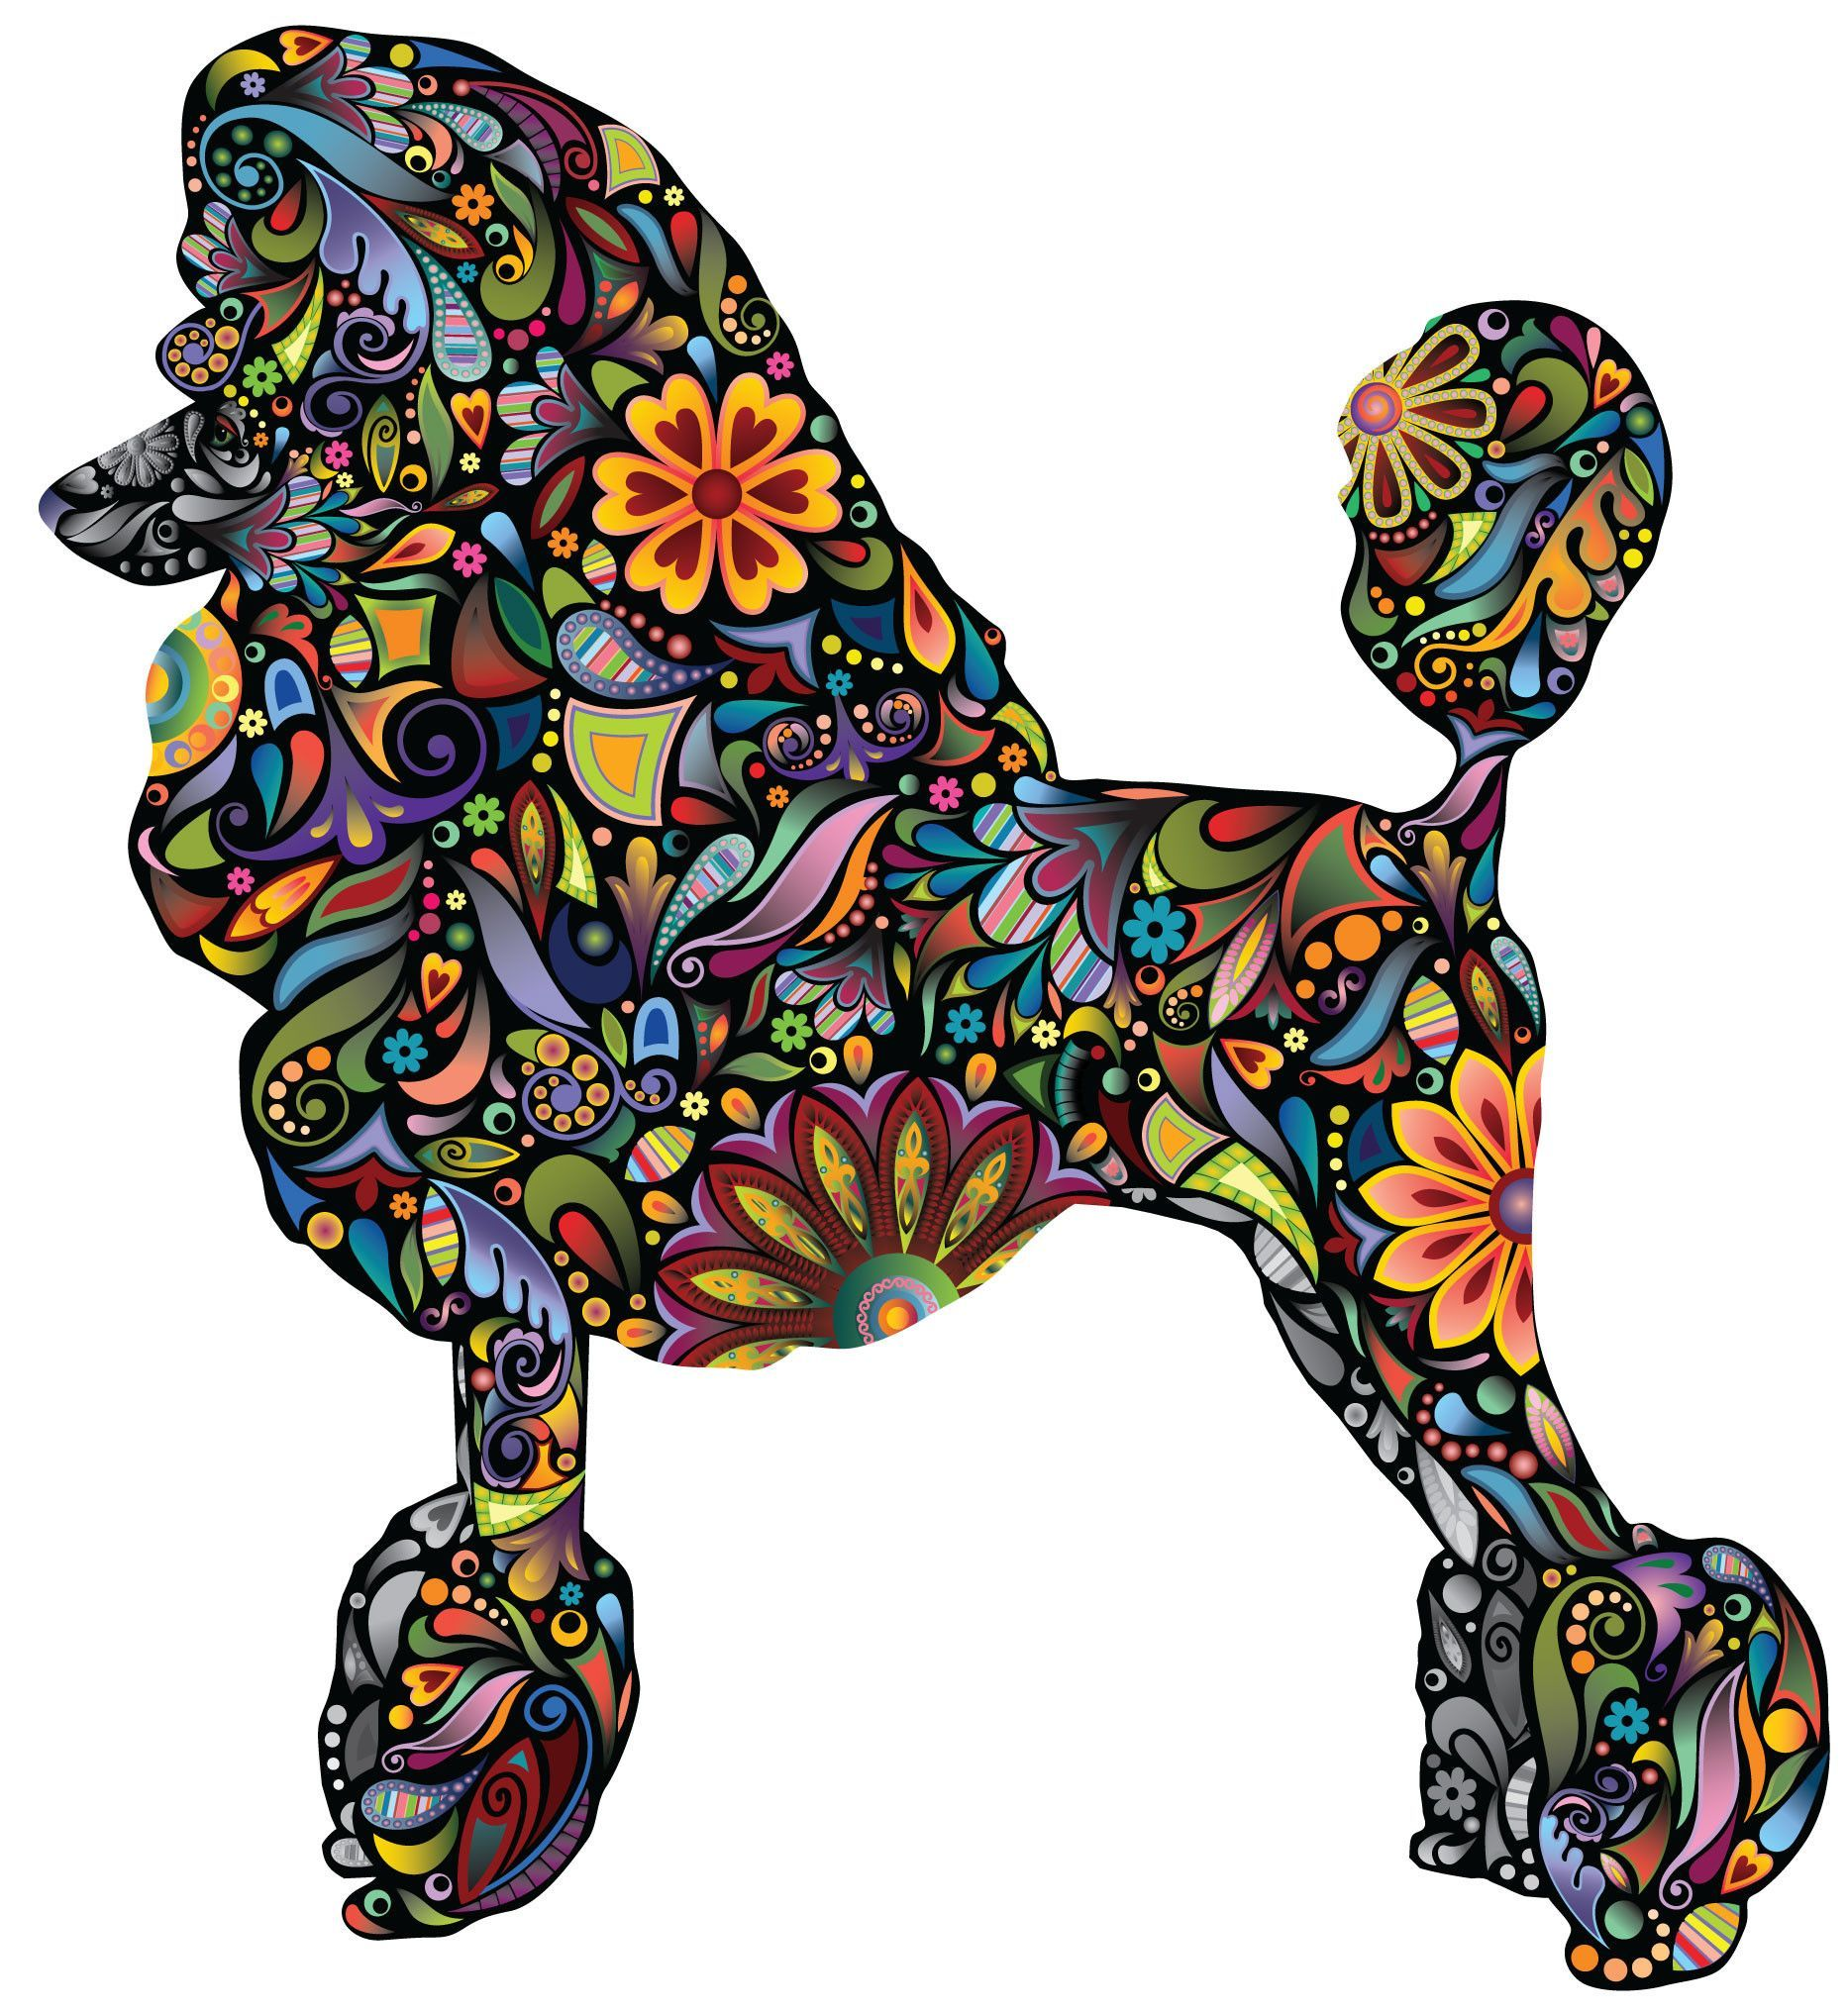 Standard Poodle Dog Decal Wall Sticker | Perros grandes, Piedras ...